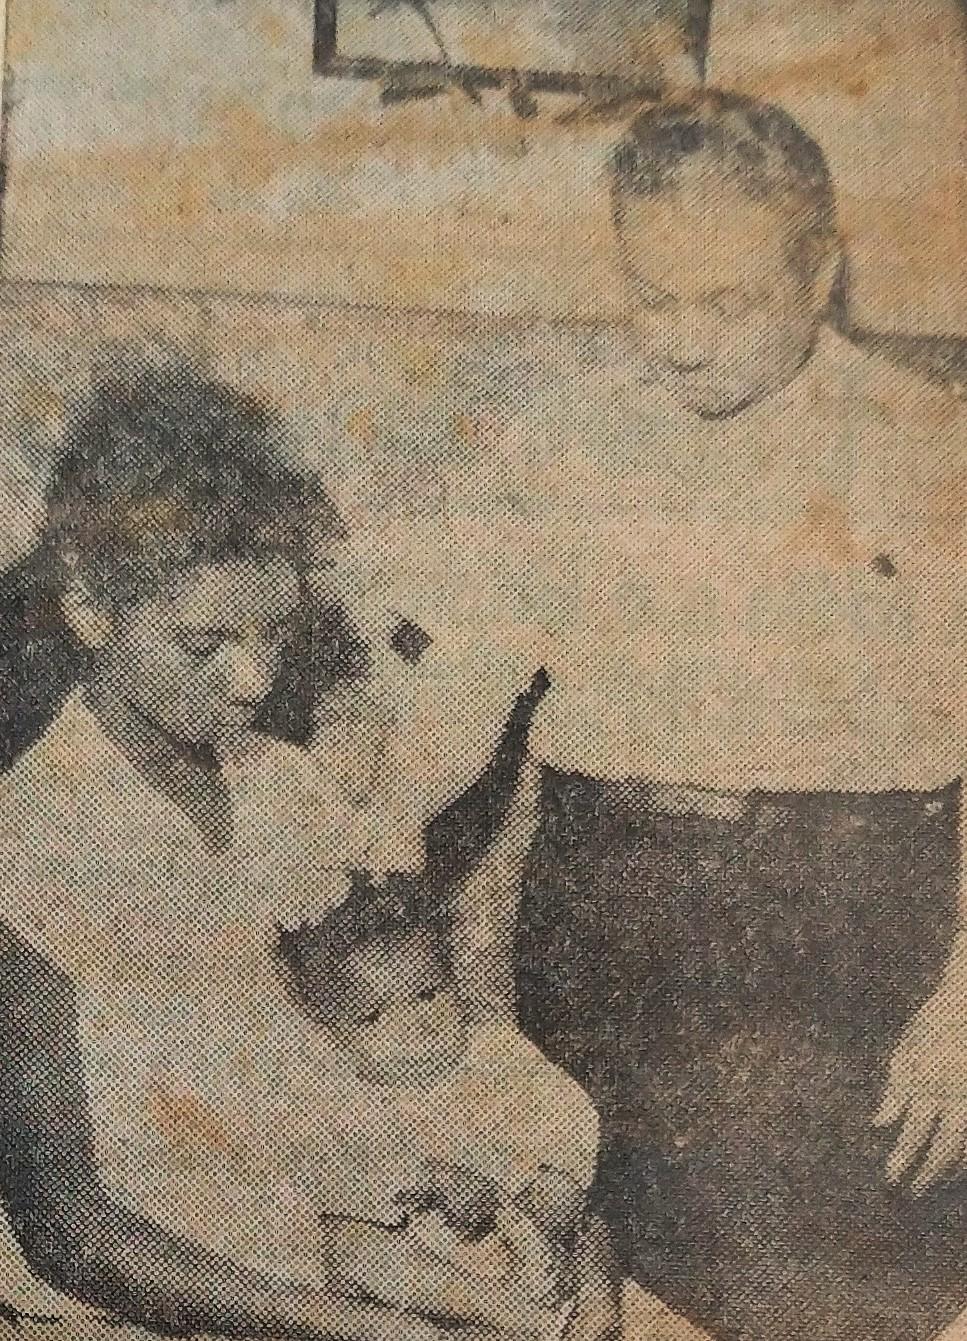 Curandeiro questionado - 1962